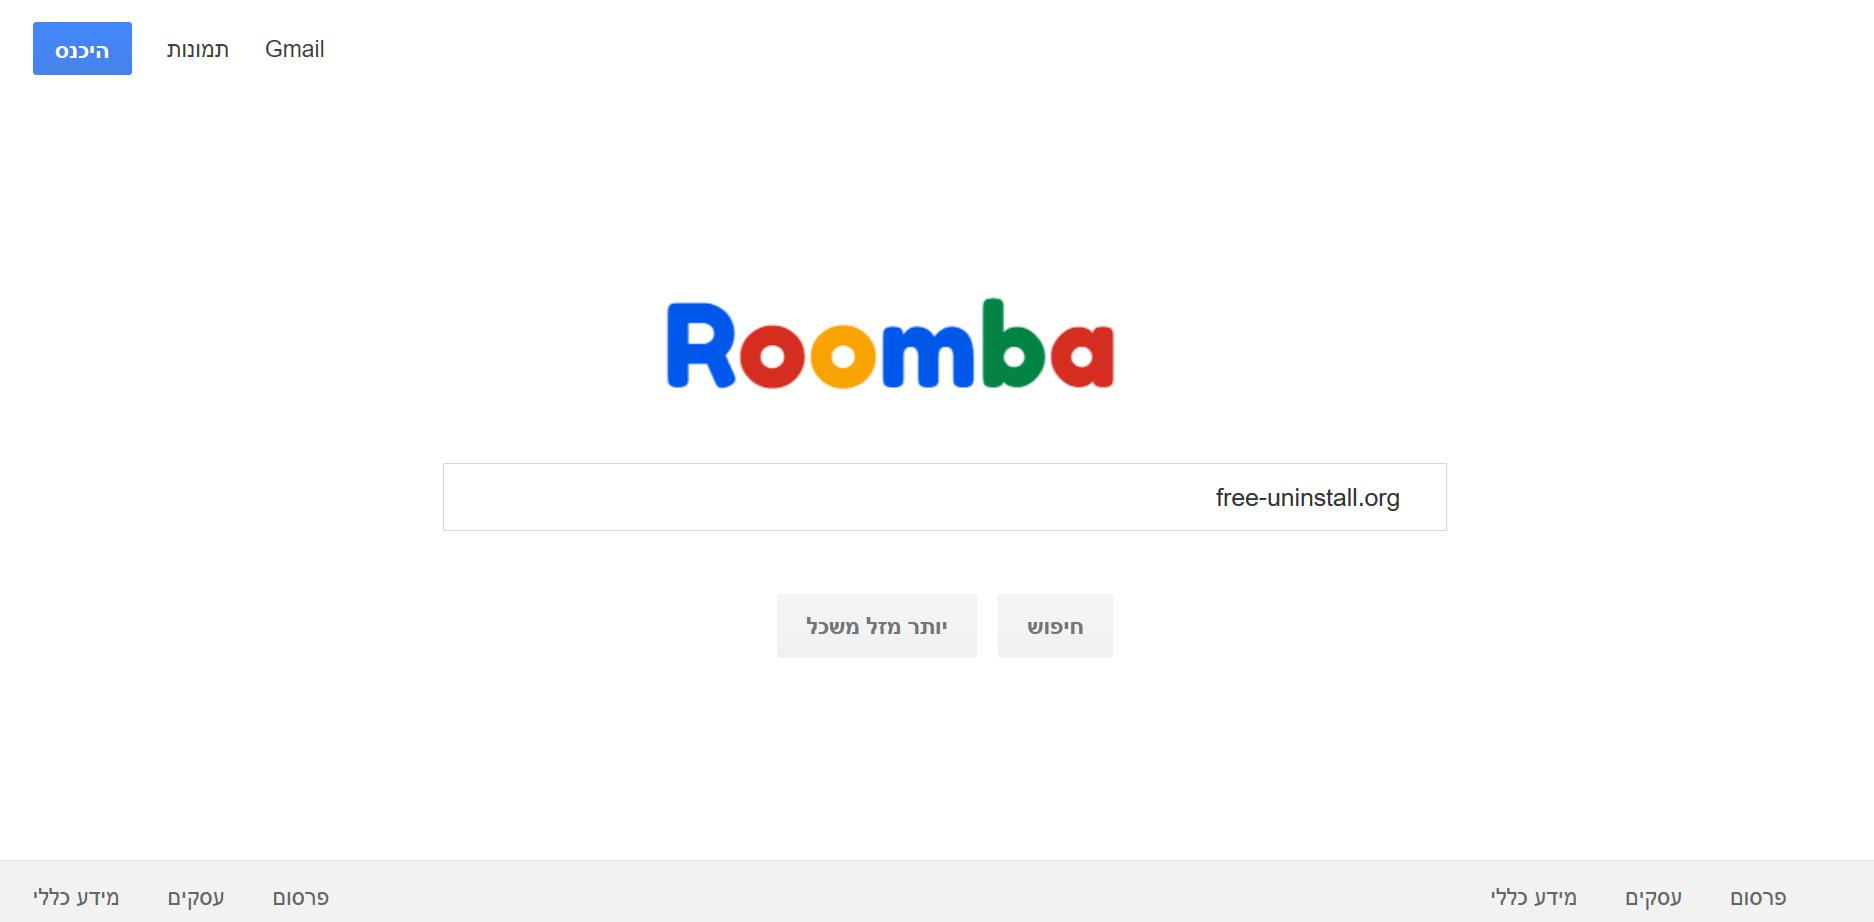 Roomba-search.com hijacker